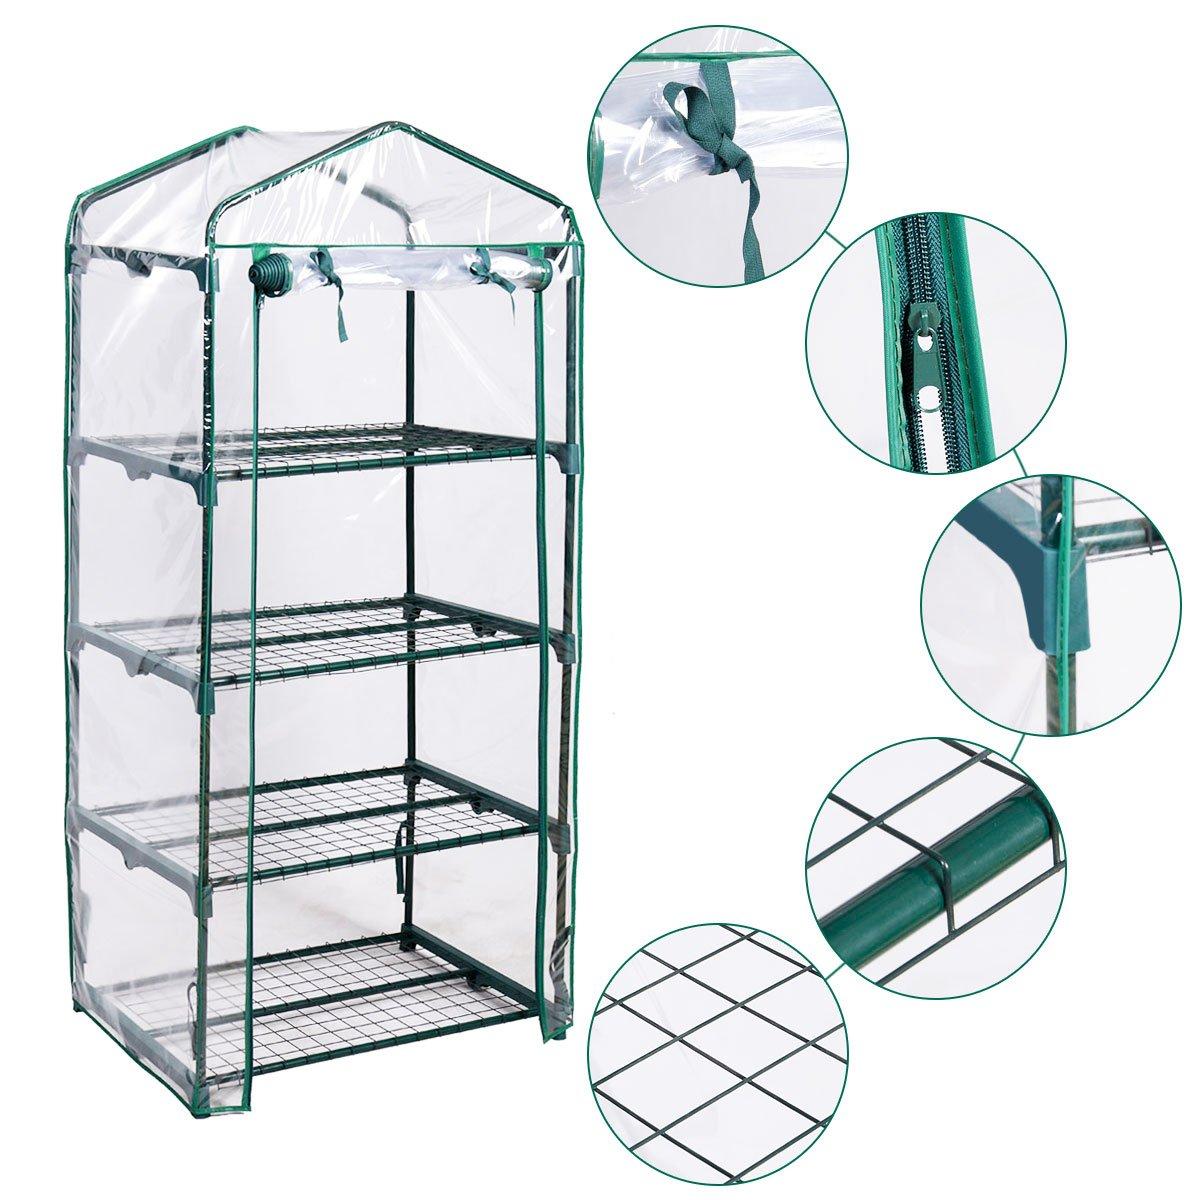 Giantex Portable Mini Walk In Outdoor 4 Shelves Greenhouse